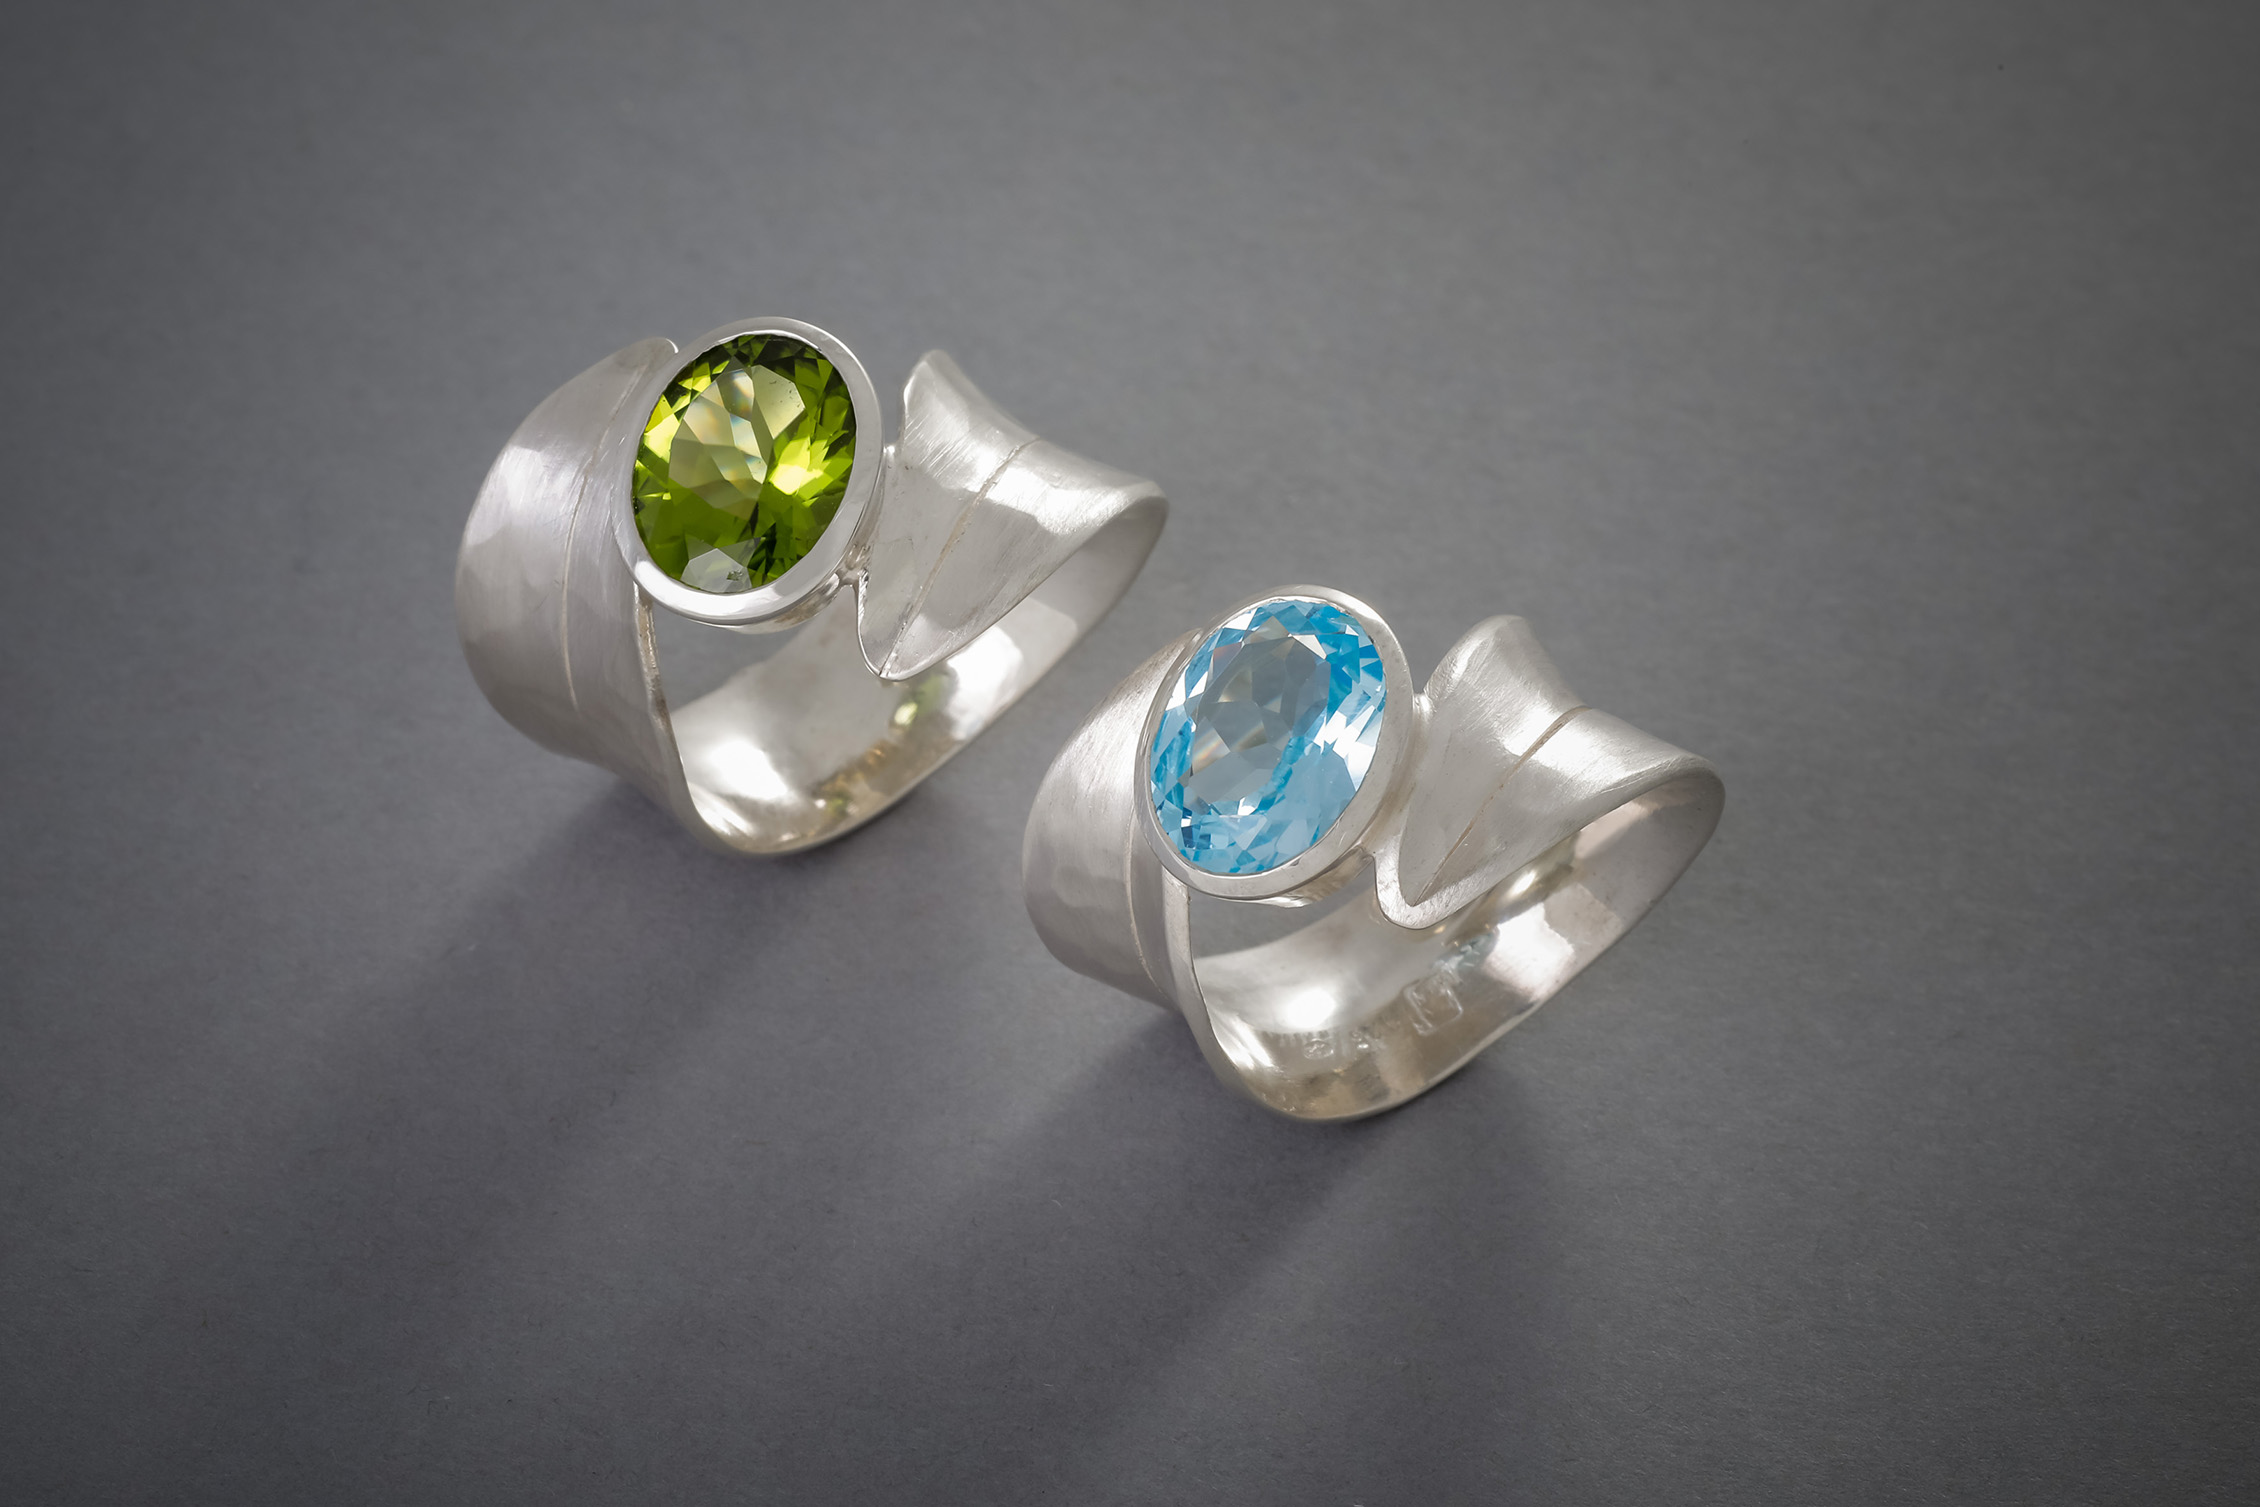 014 Silberringe, Topas blau, ab € 328,- Peridot, ab € 458,-